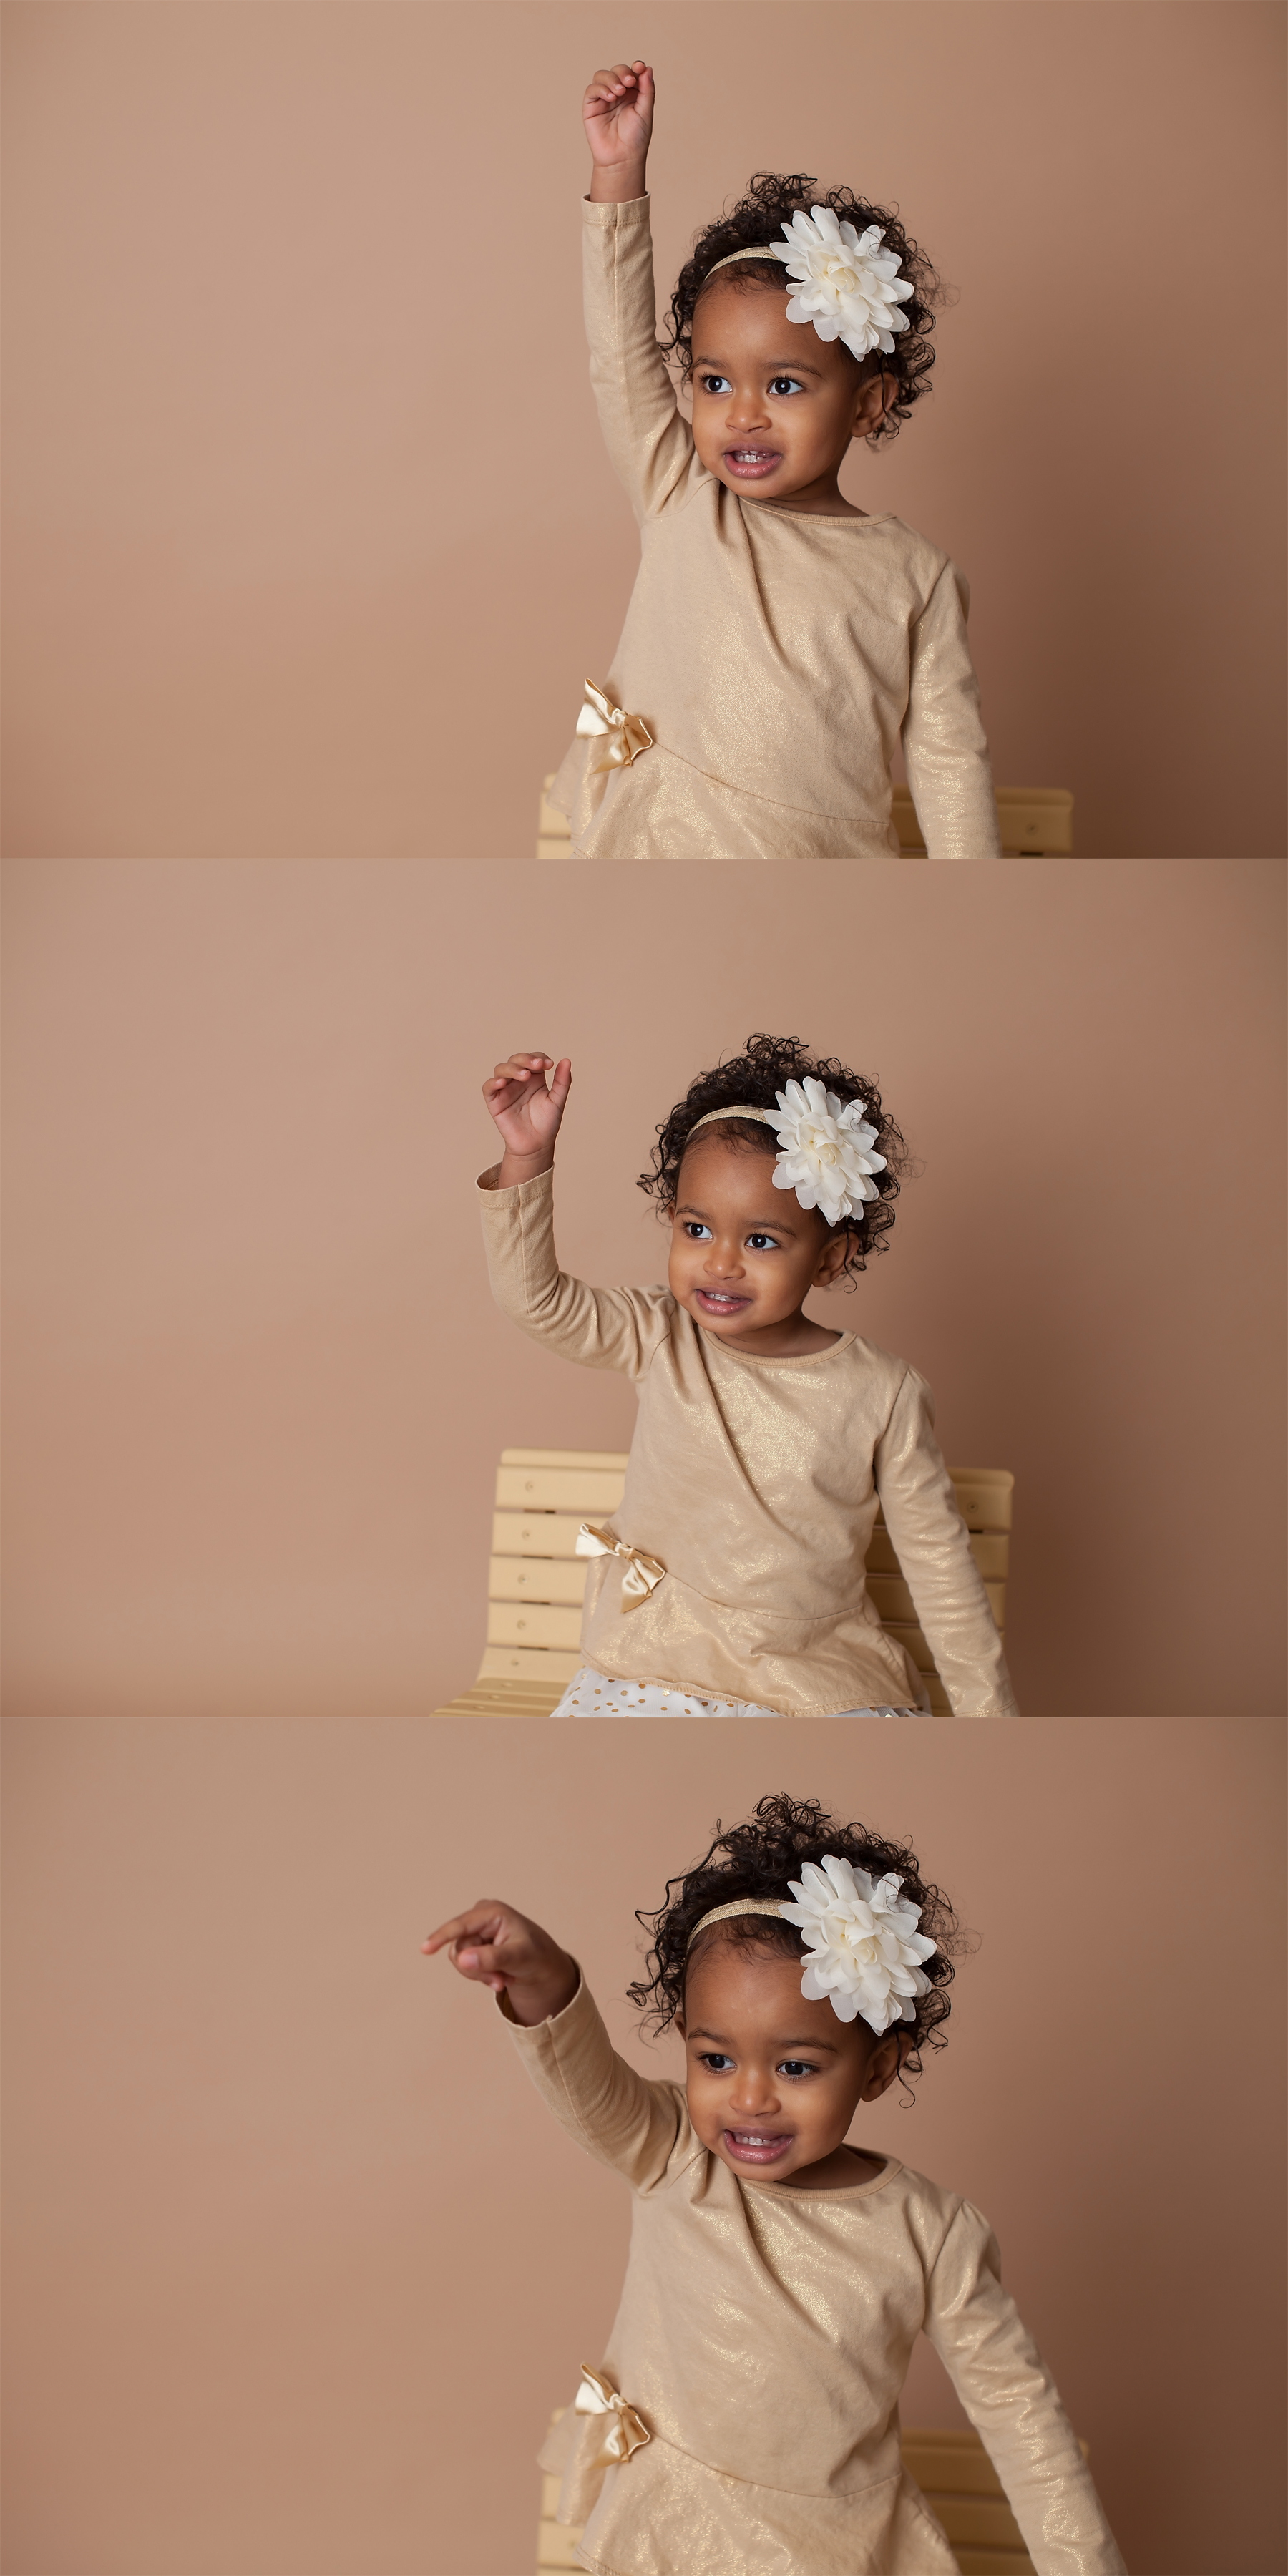 Worthington child photographer, photography at Powell Studio